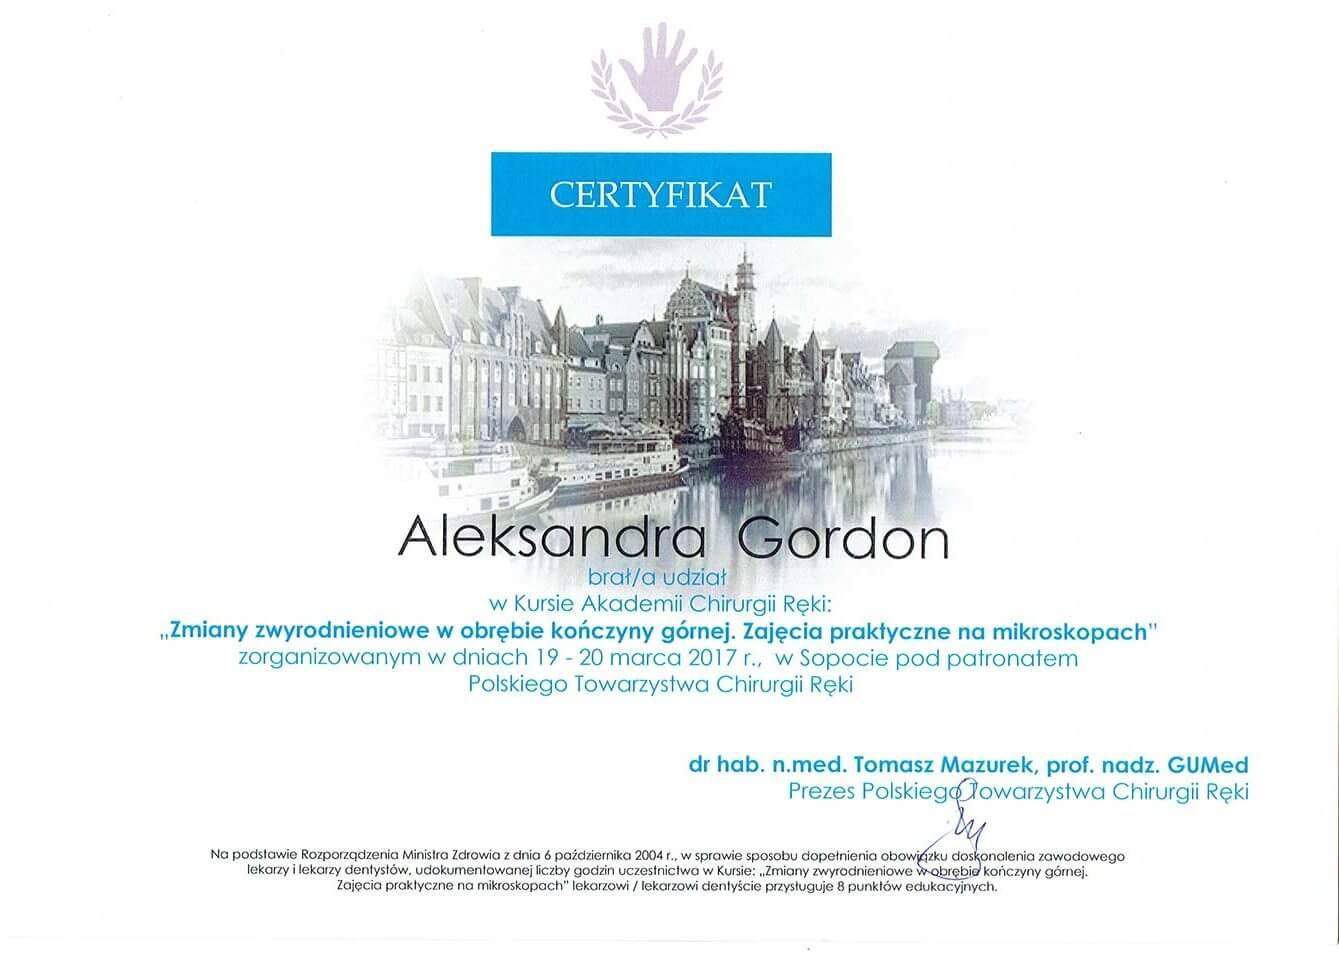 aleksandra-gordon-certyfikat-dyplom (2)